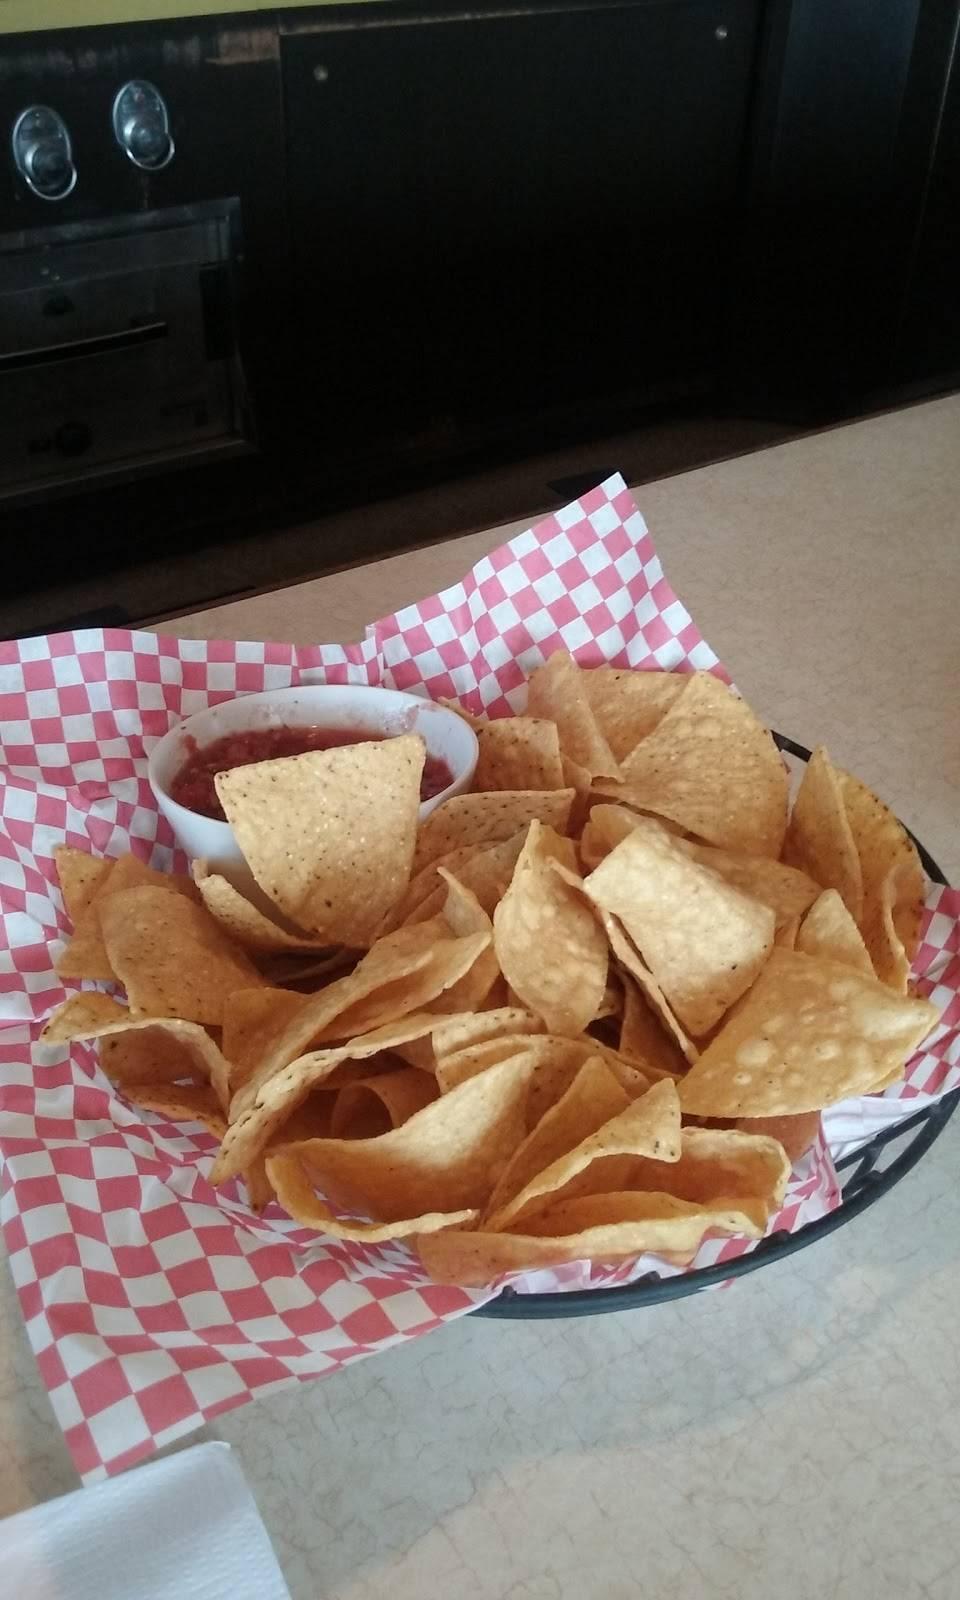 Speakeasy Bar & Grill | restaurant | 15680 SW Upper Boones Ferry Rd, Lake Oswego, OR 97035, USA | 5036840380 OR +1 503-684-0380